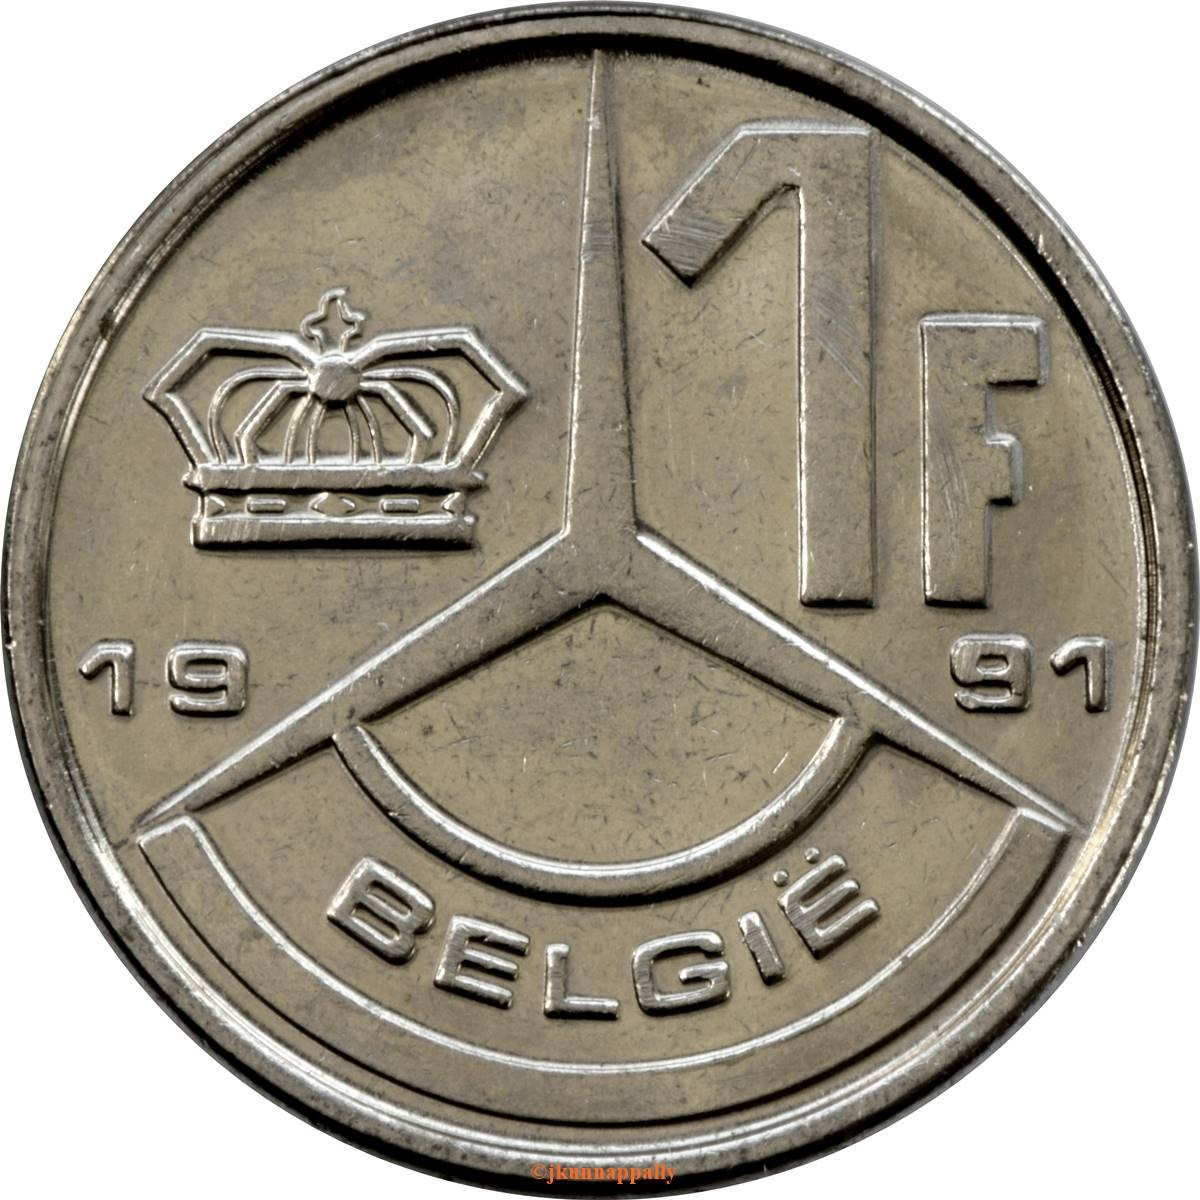 Belgium 1 Franc (1989-1993 Baudouin I-Dutch text)